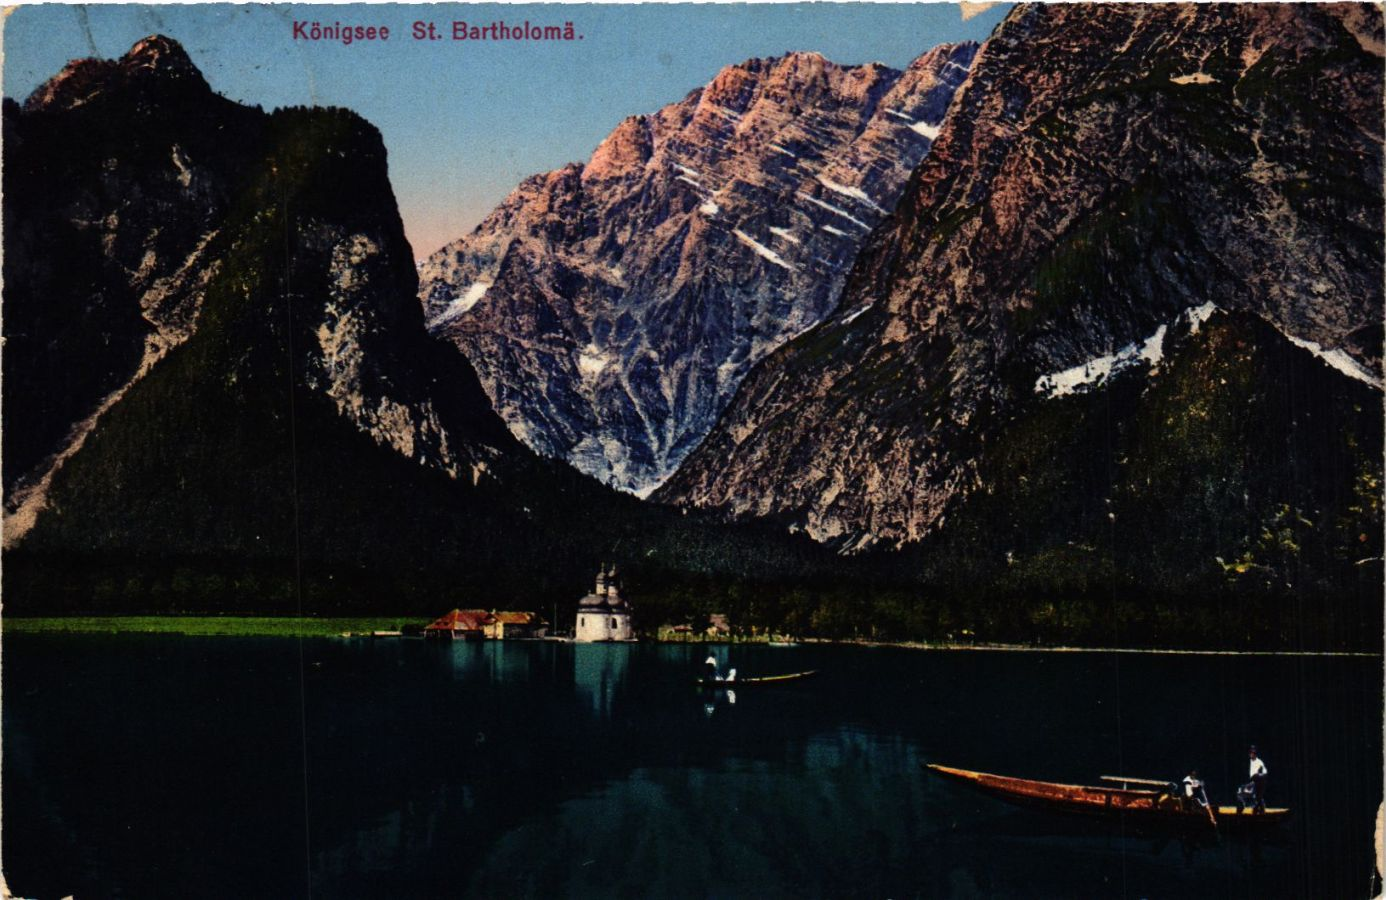 CPA-AK-Konigssee-St-Bartholoma-GERMANY-879281